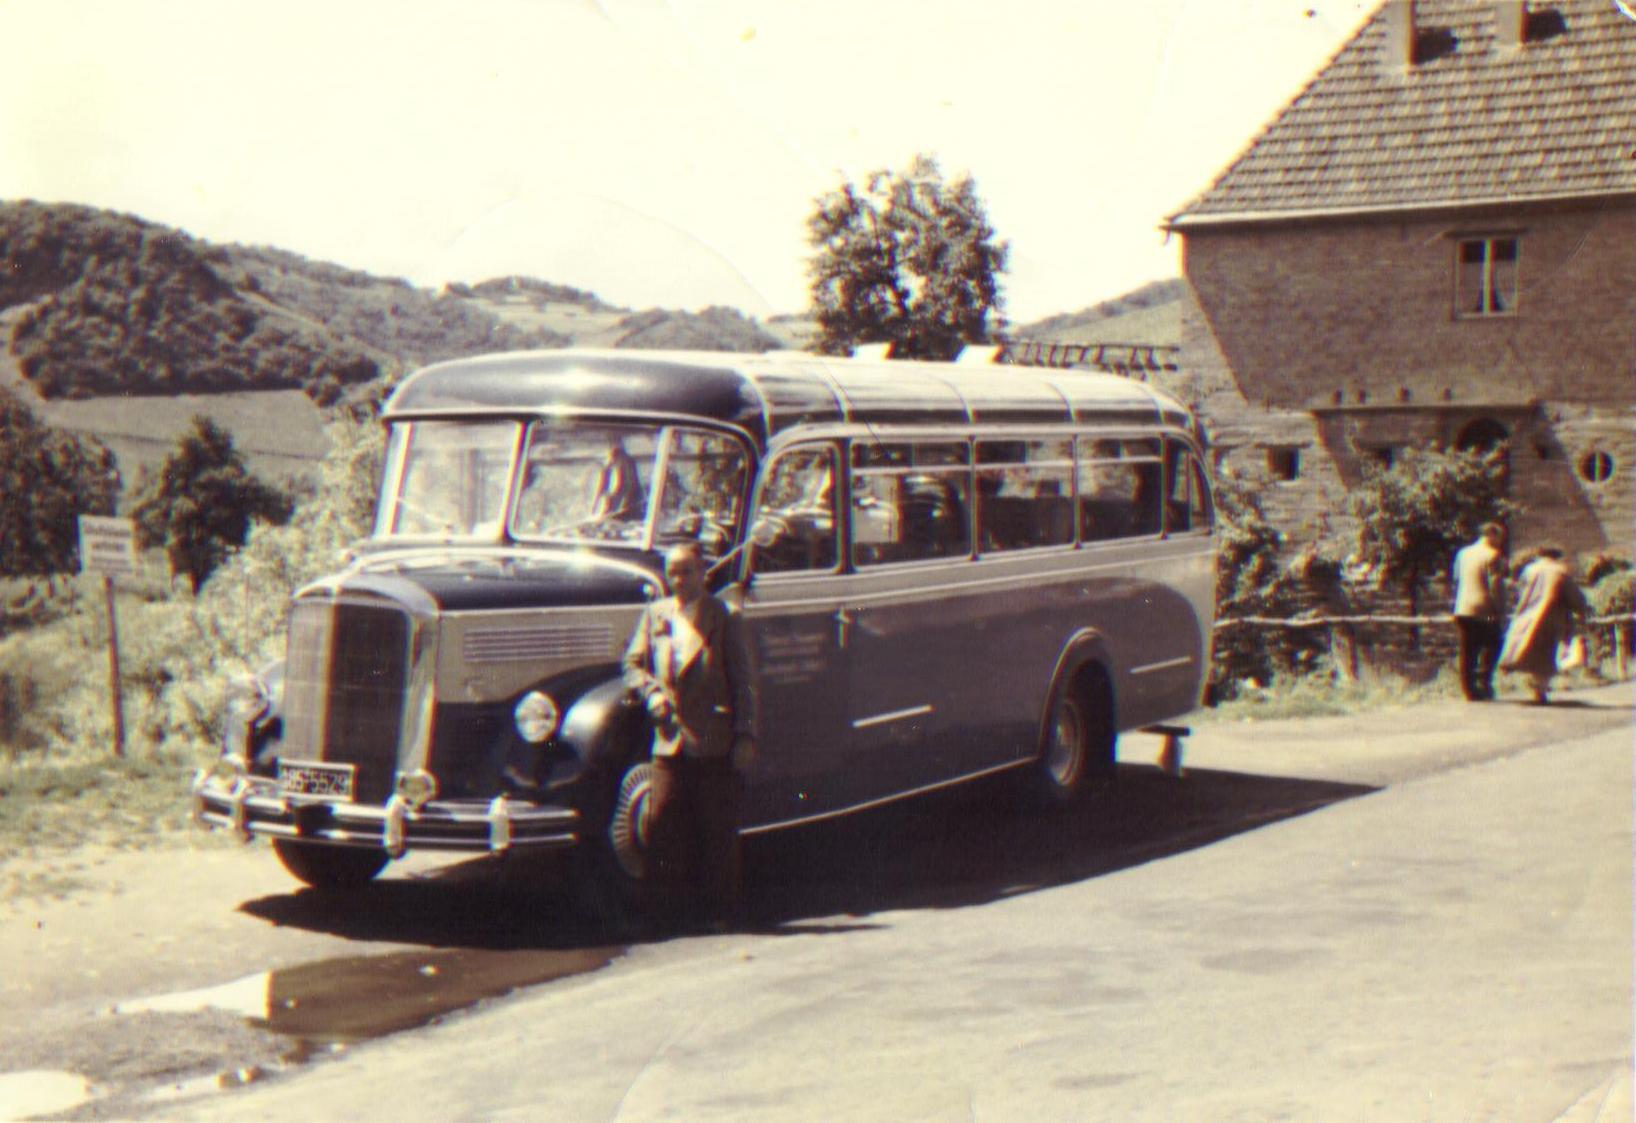 Historie - Konrad Sommer vor Omnibus